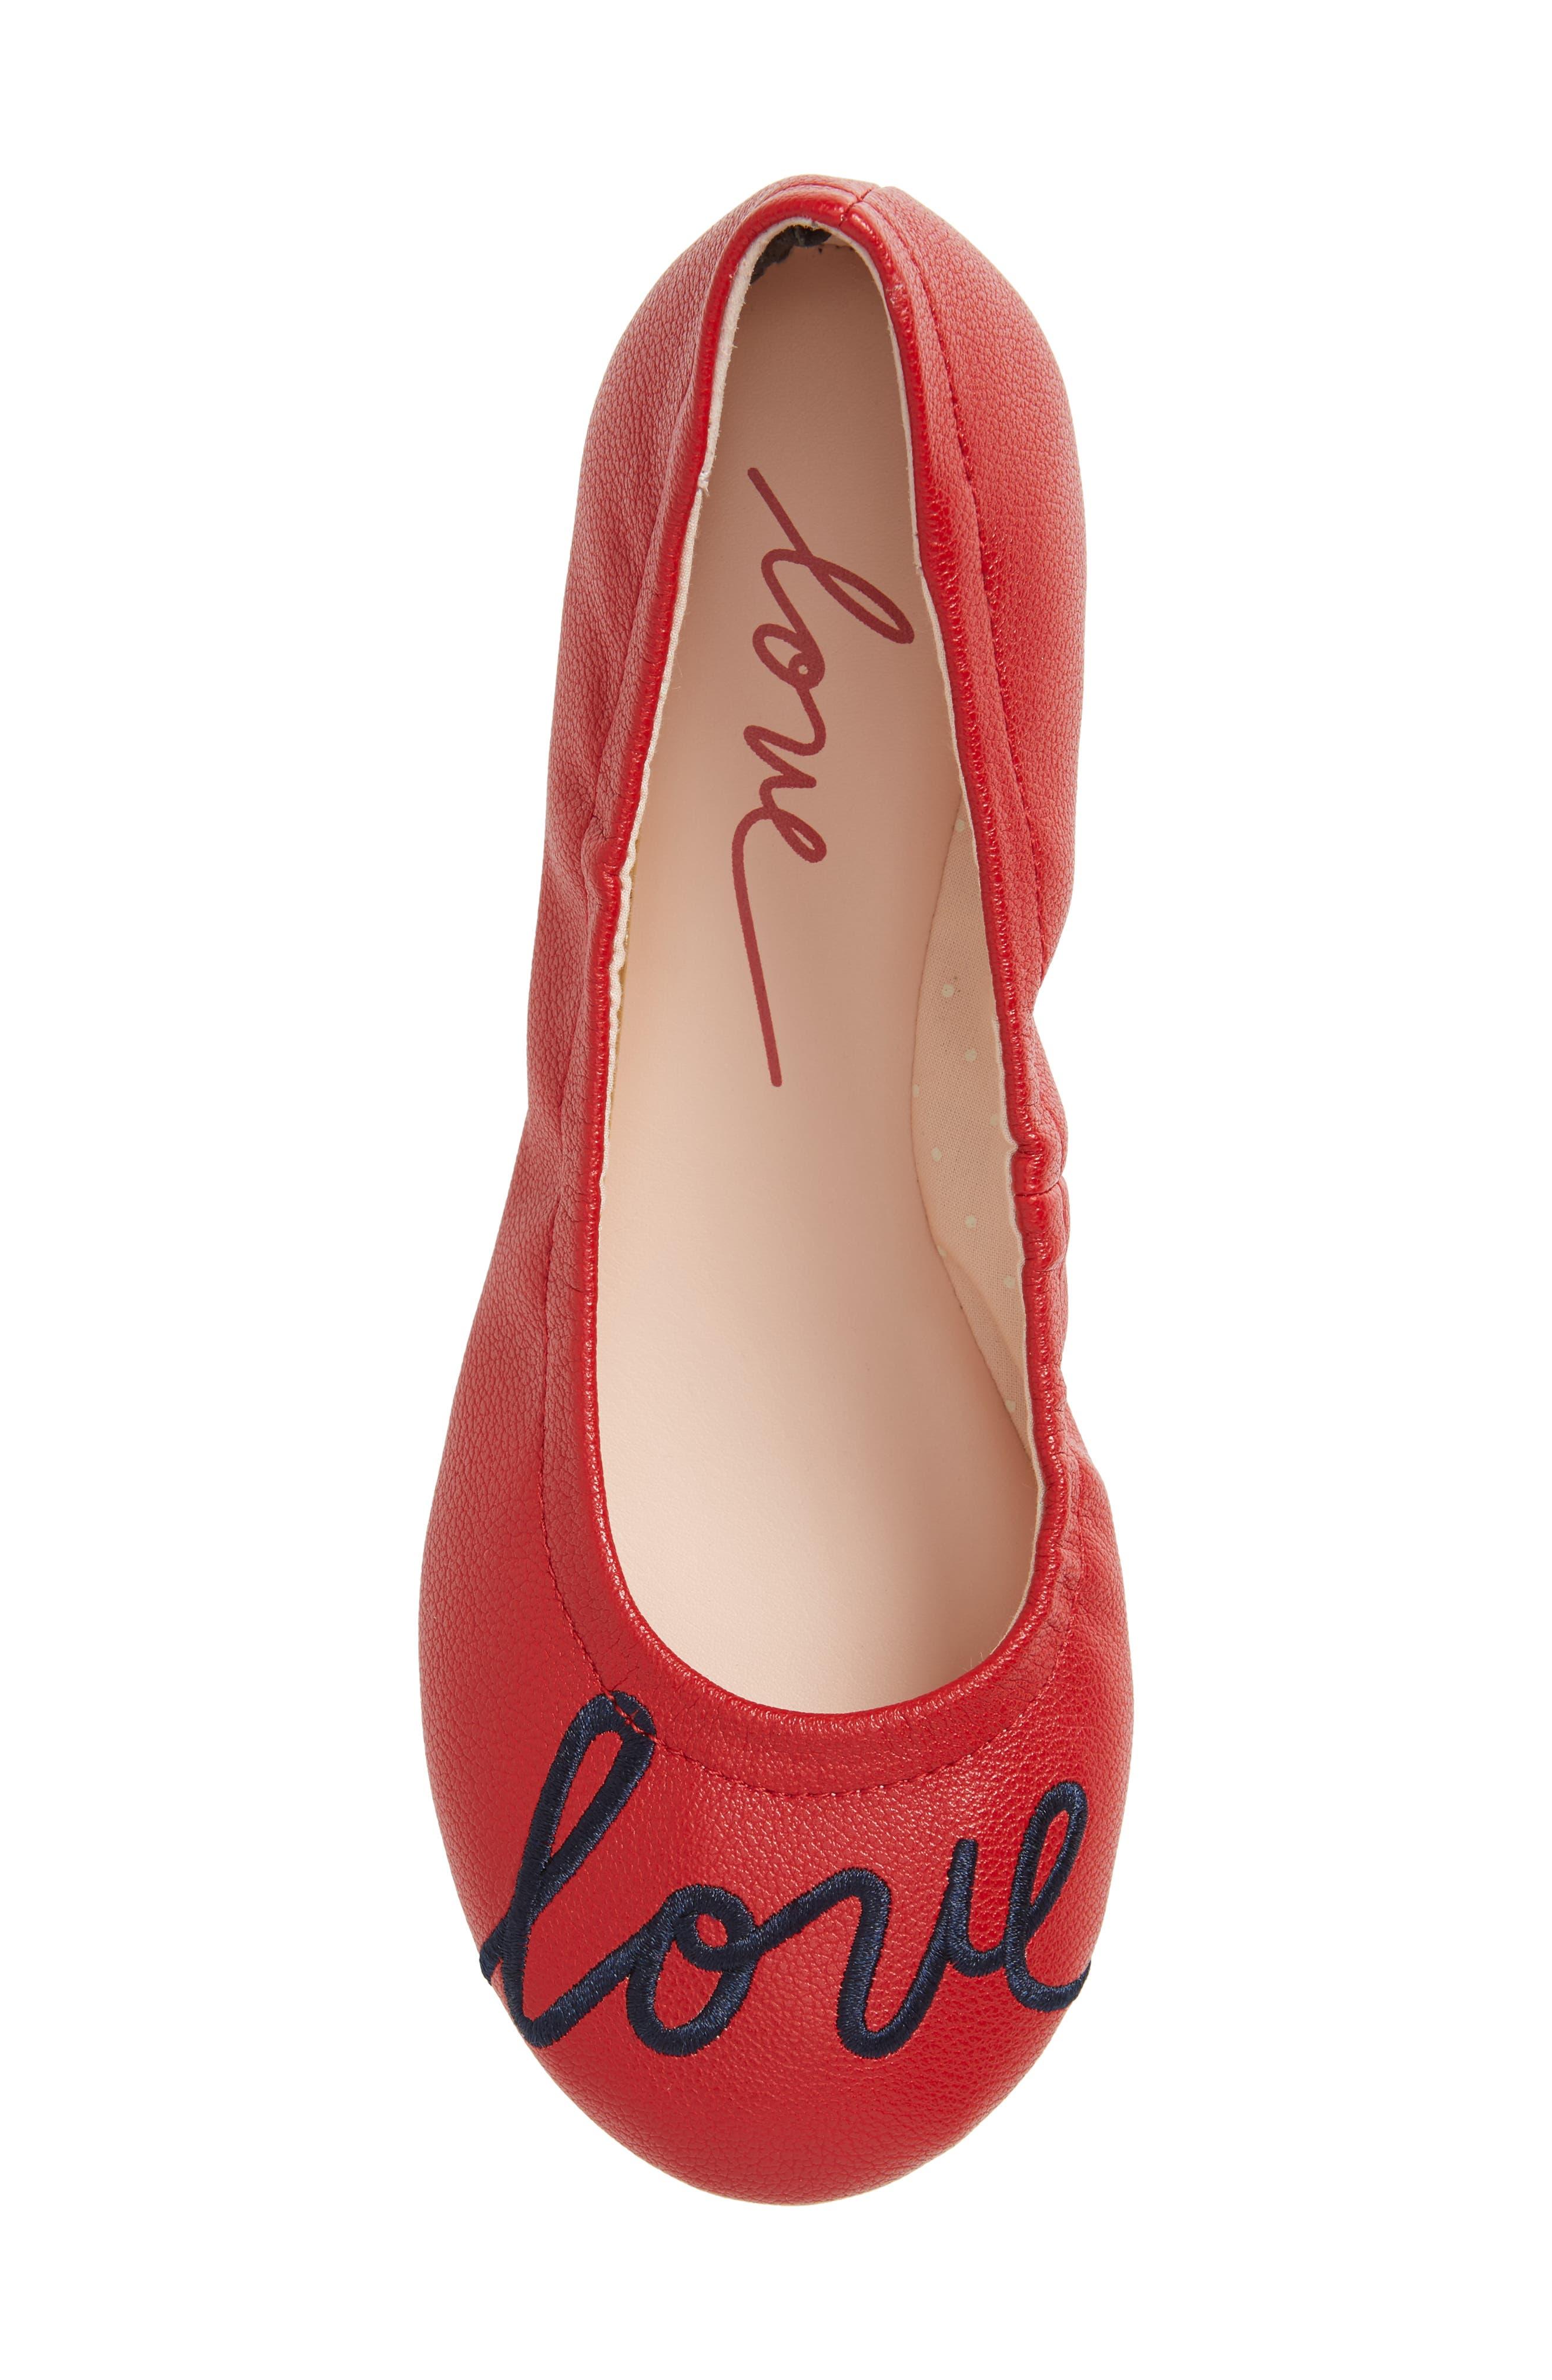 Langlee Embroidered Ballet Flat,                             Alternate thumbnail 5, color,                             SALSA